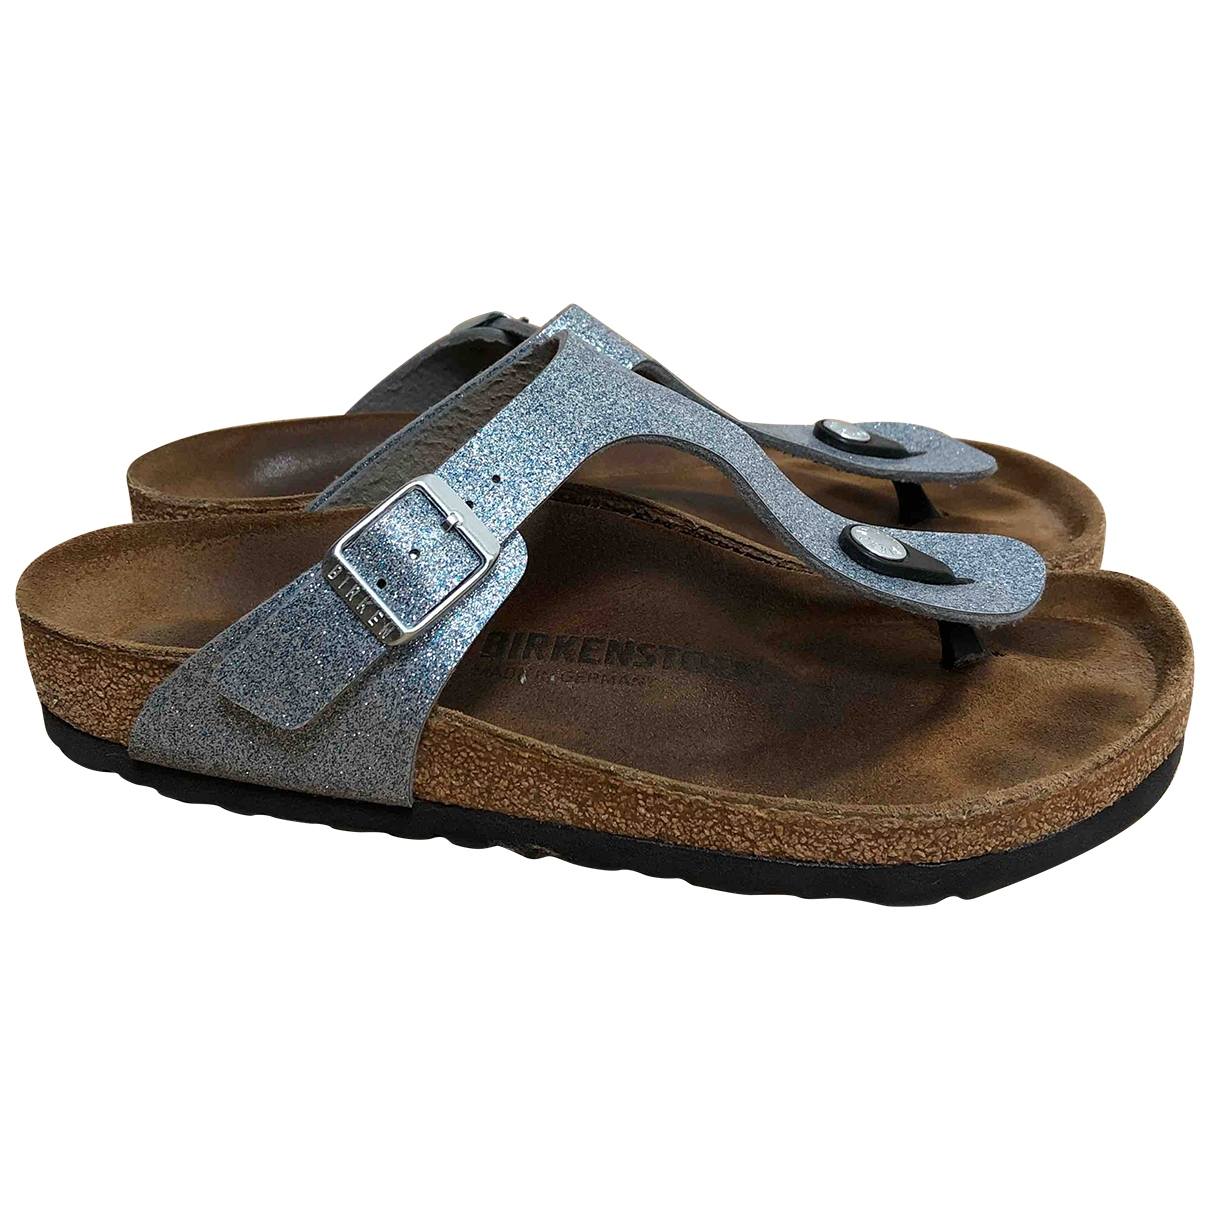 Birkenstock \N Silver Leather Sandals for Women 4.5 UK